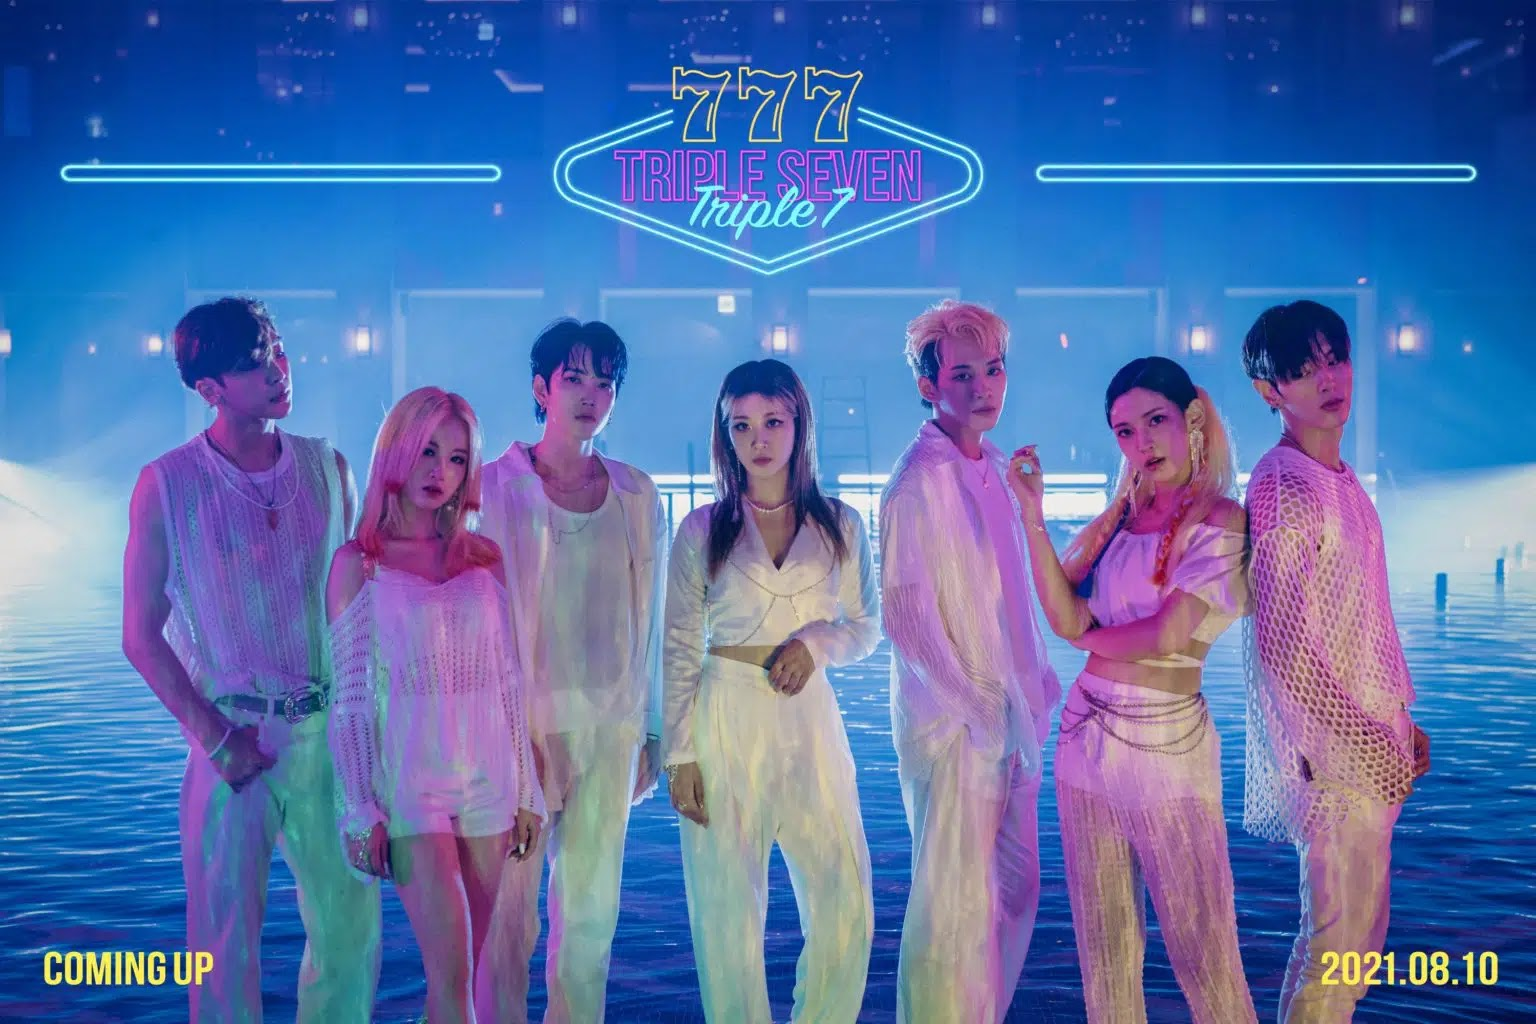 Co-Ed Triple7 Pose Together in Debut Teaser